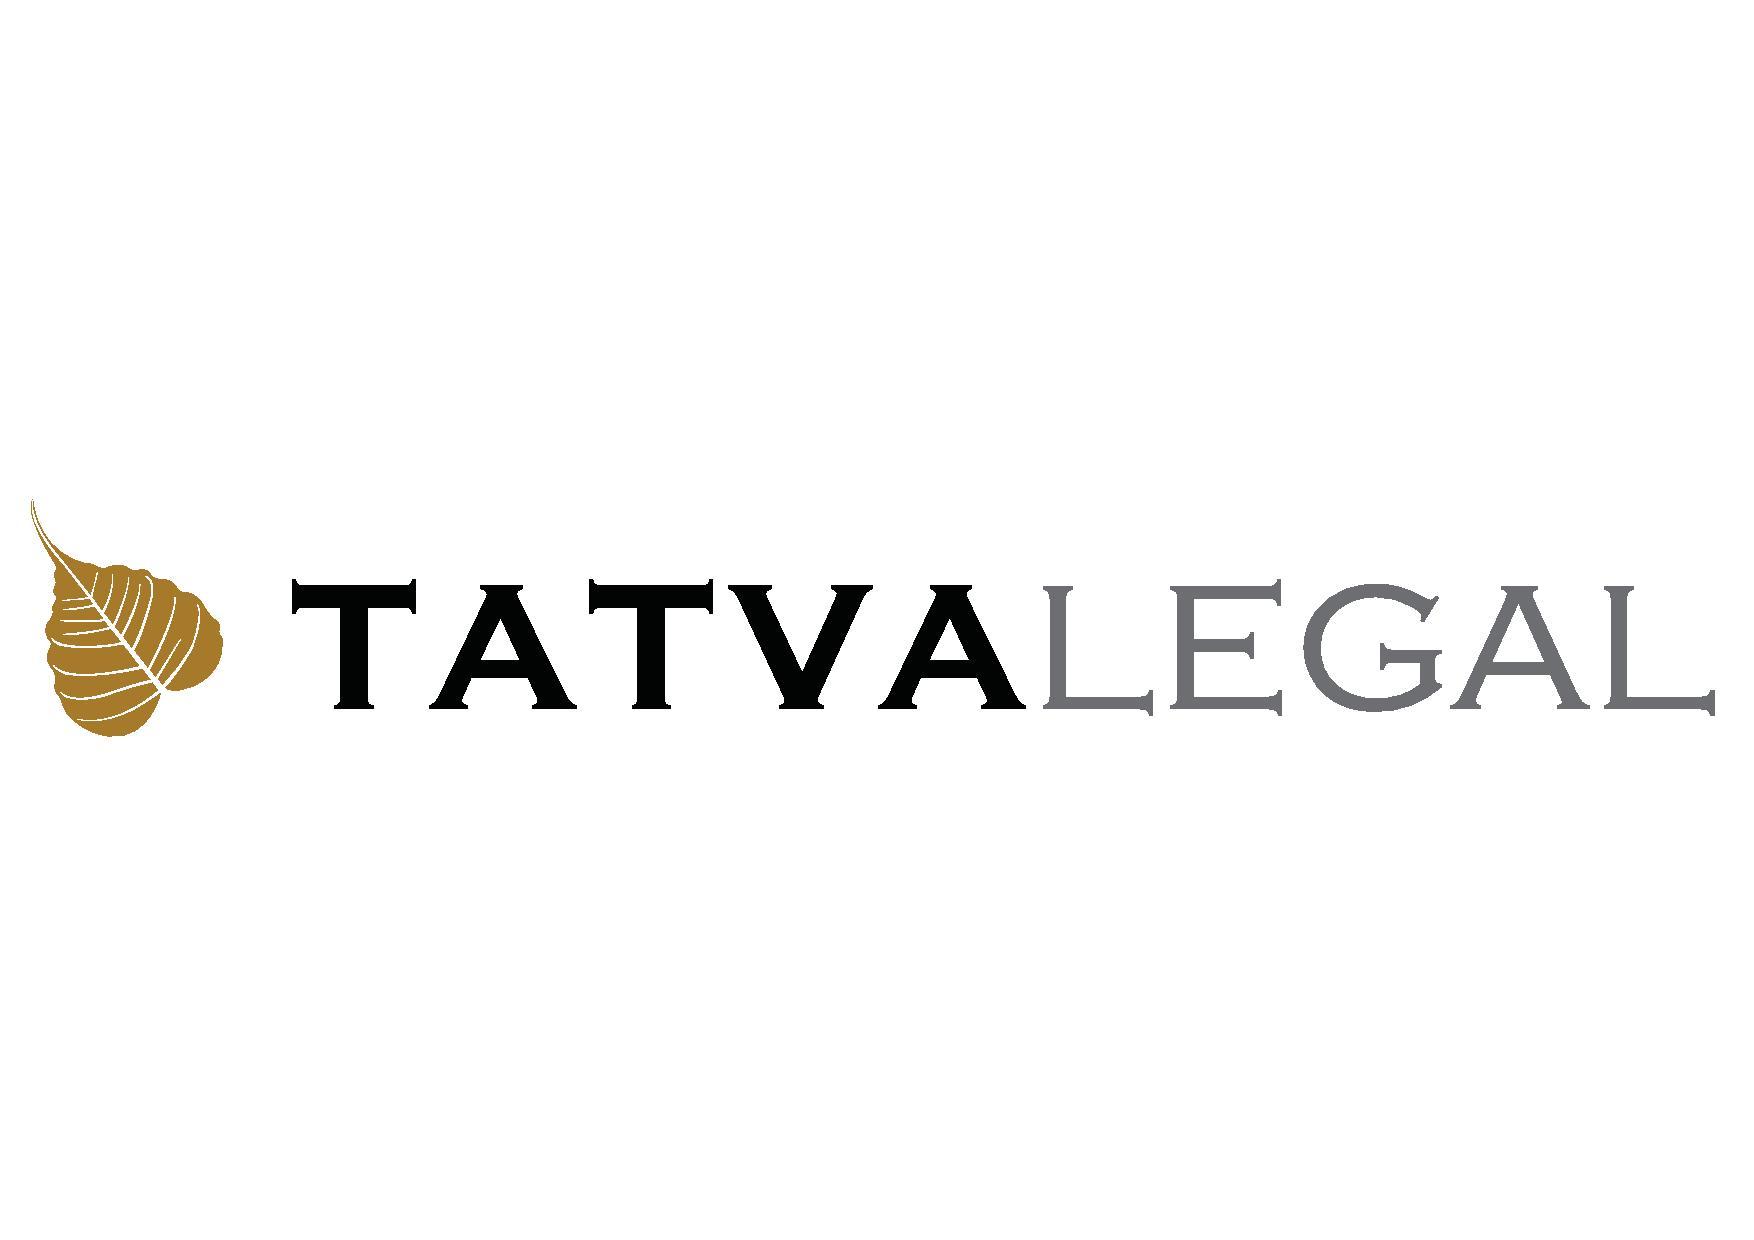 Tatva Legal